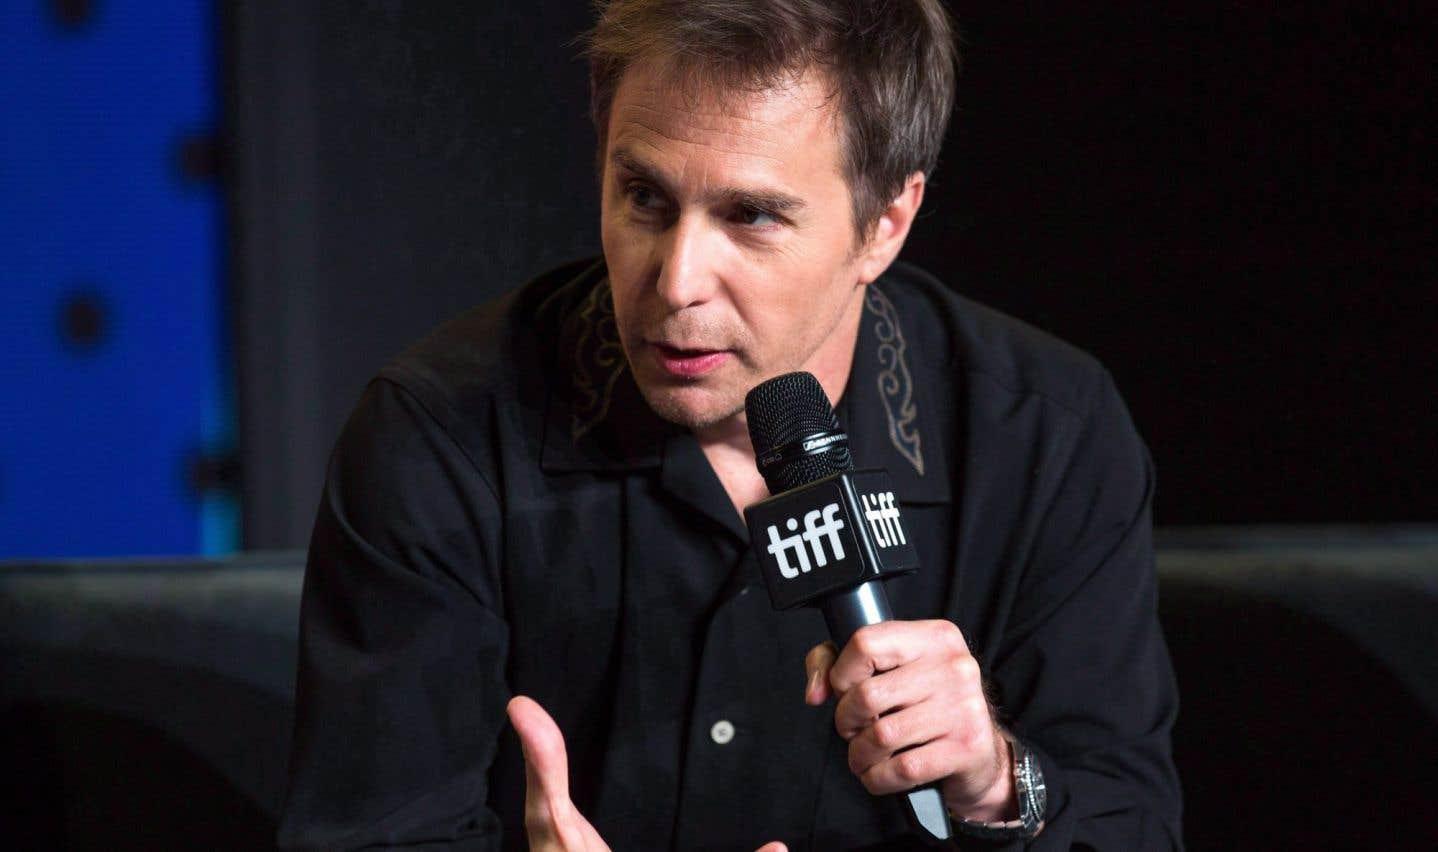 L'acteur Sam Rockwell du filmThree Billboards Outside Ebbing, Missouri auToronto International Film Festival.